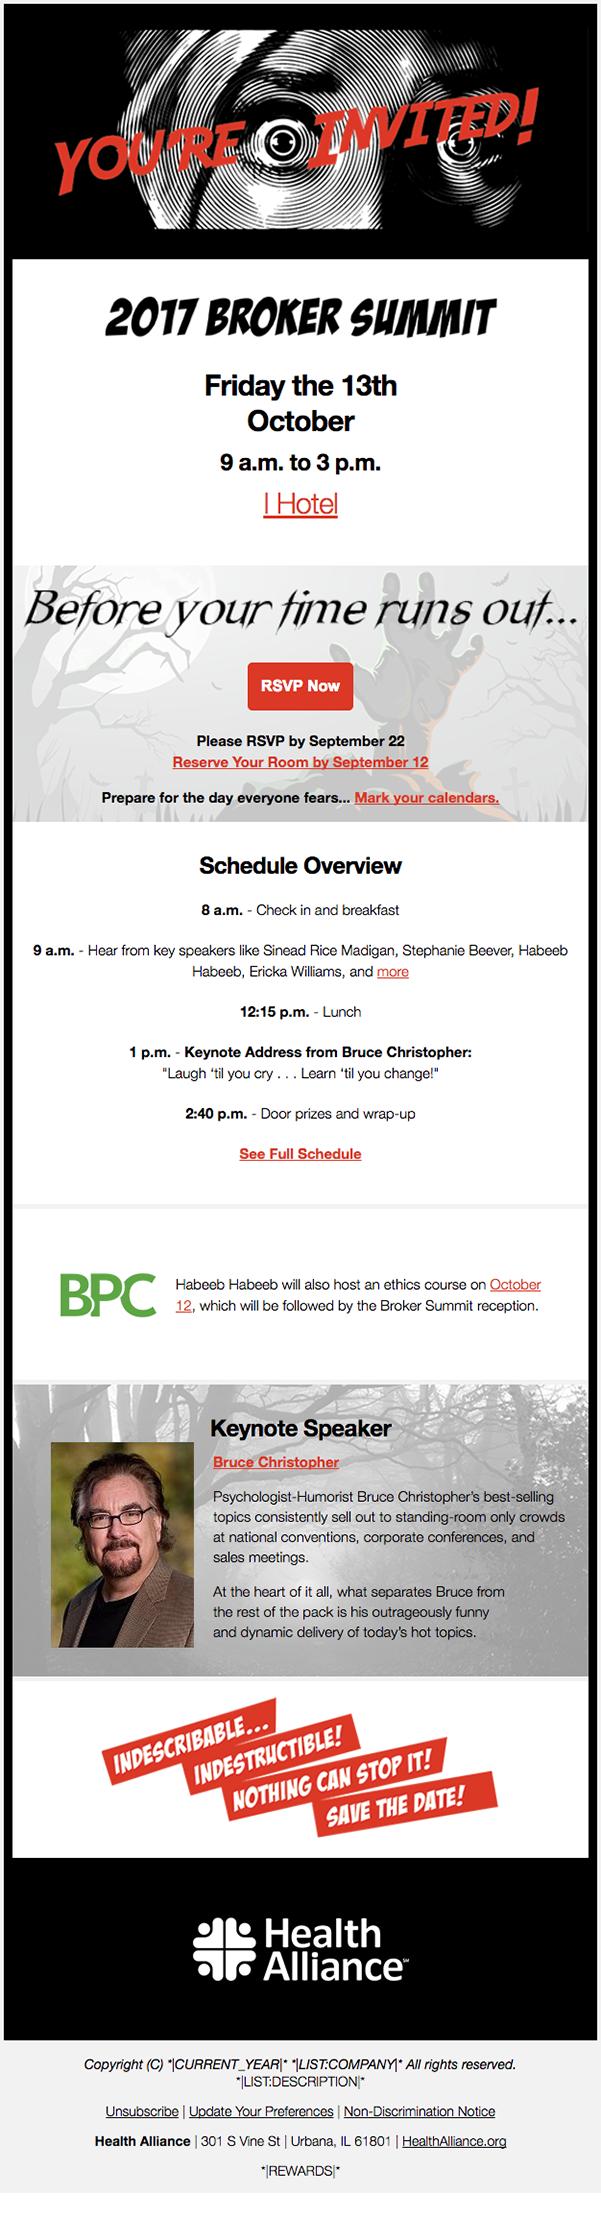 Broker Summit 2017 Invite